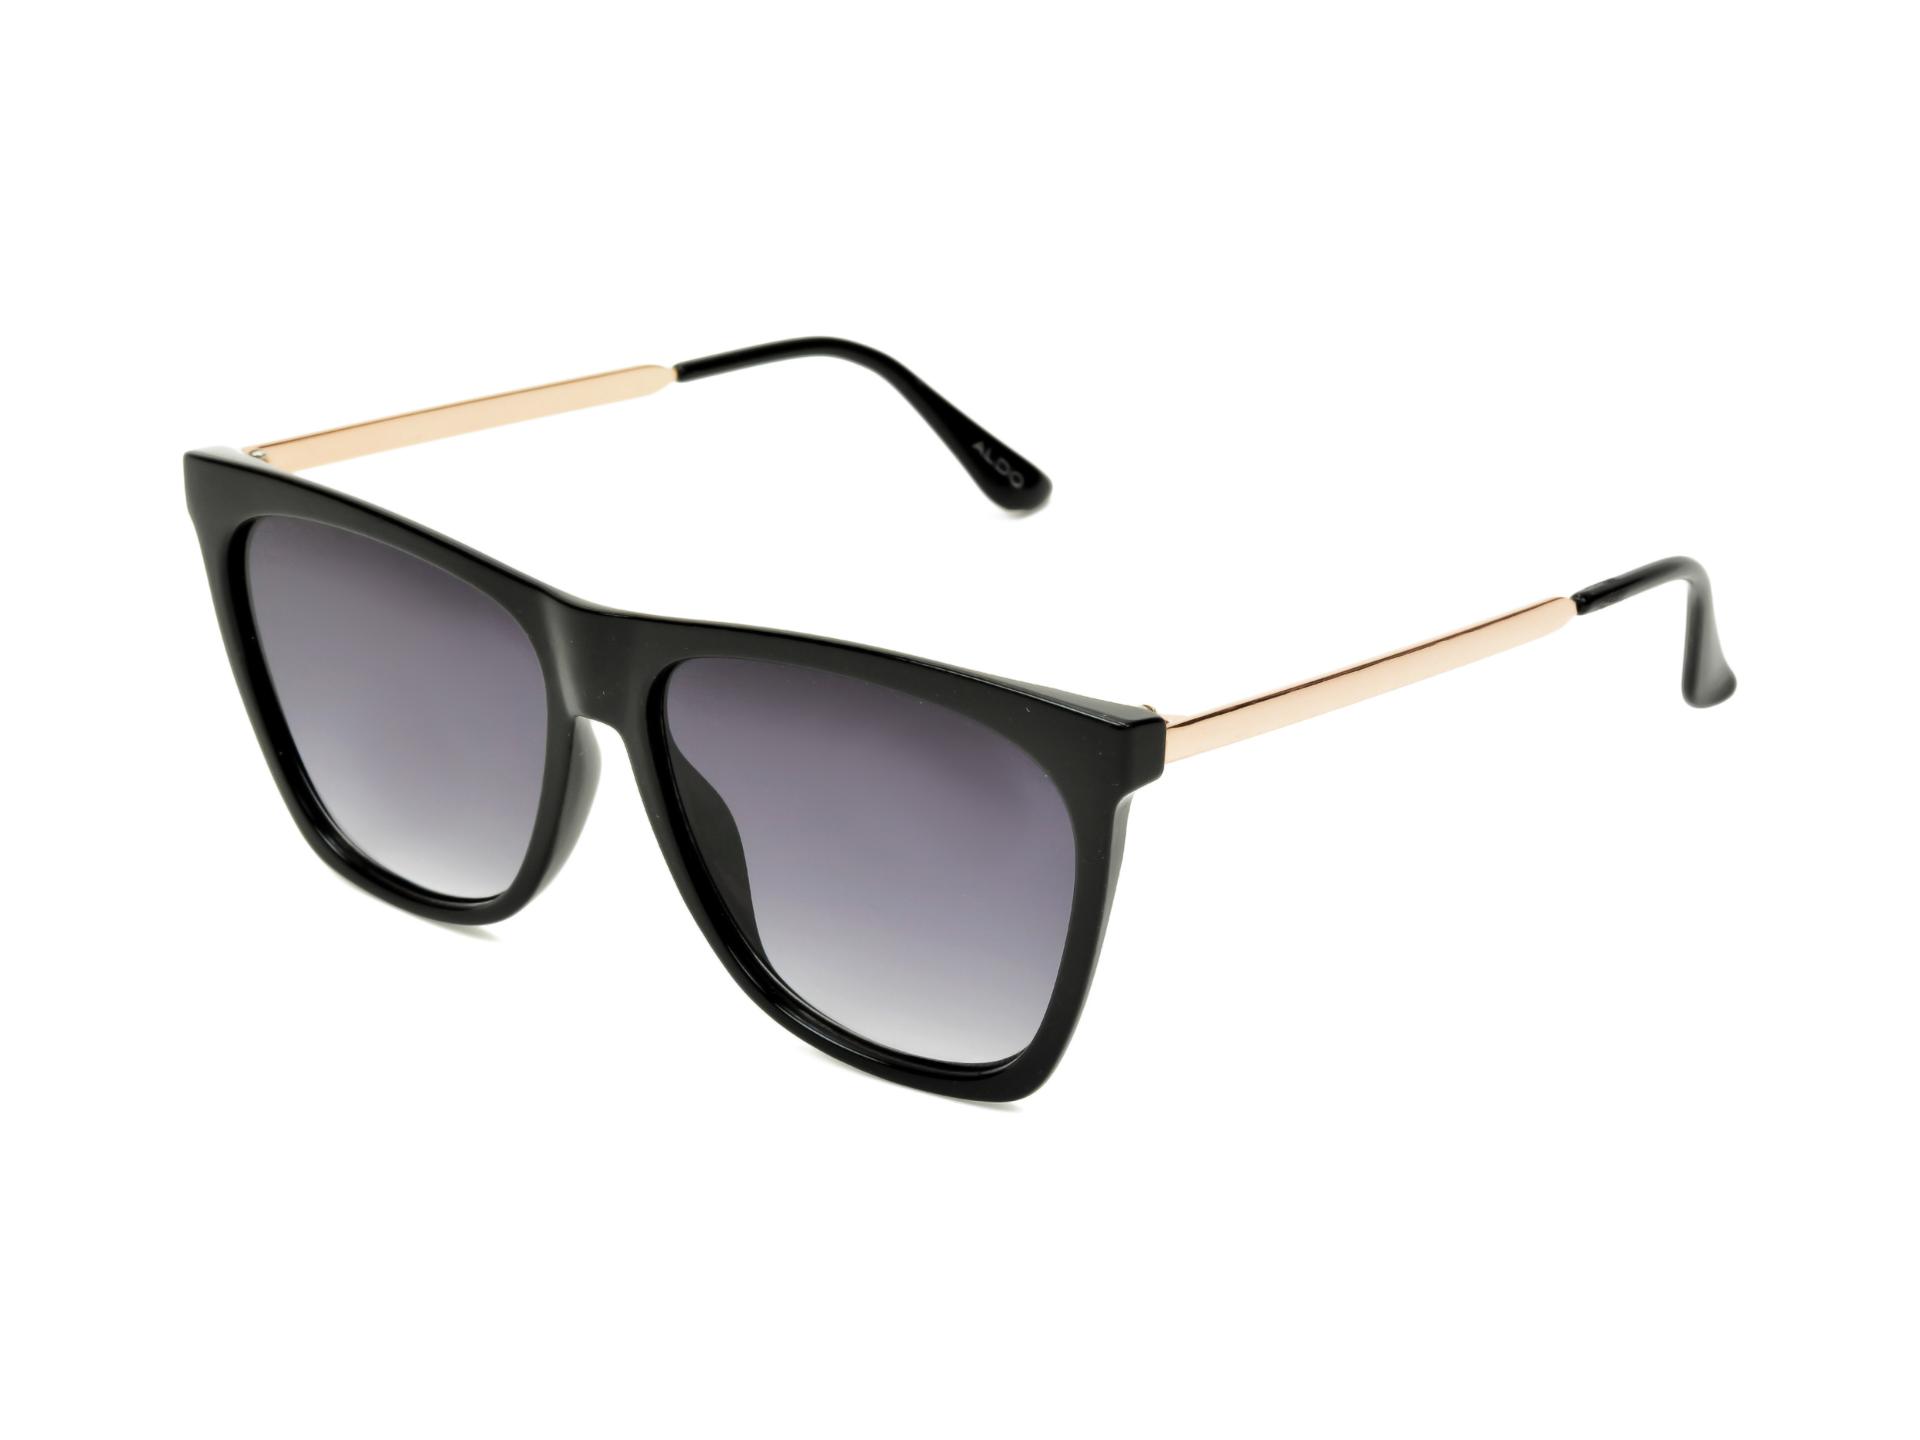 Ochelari de soare ALDO negri, Terminalia970, din PVC imagine